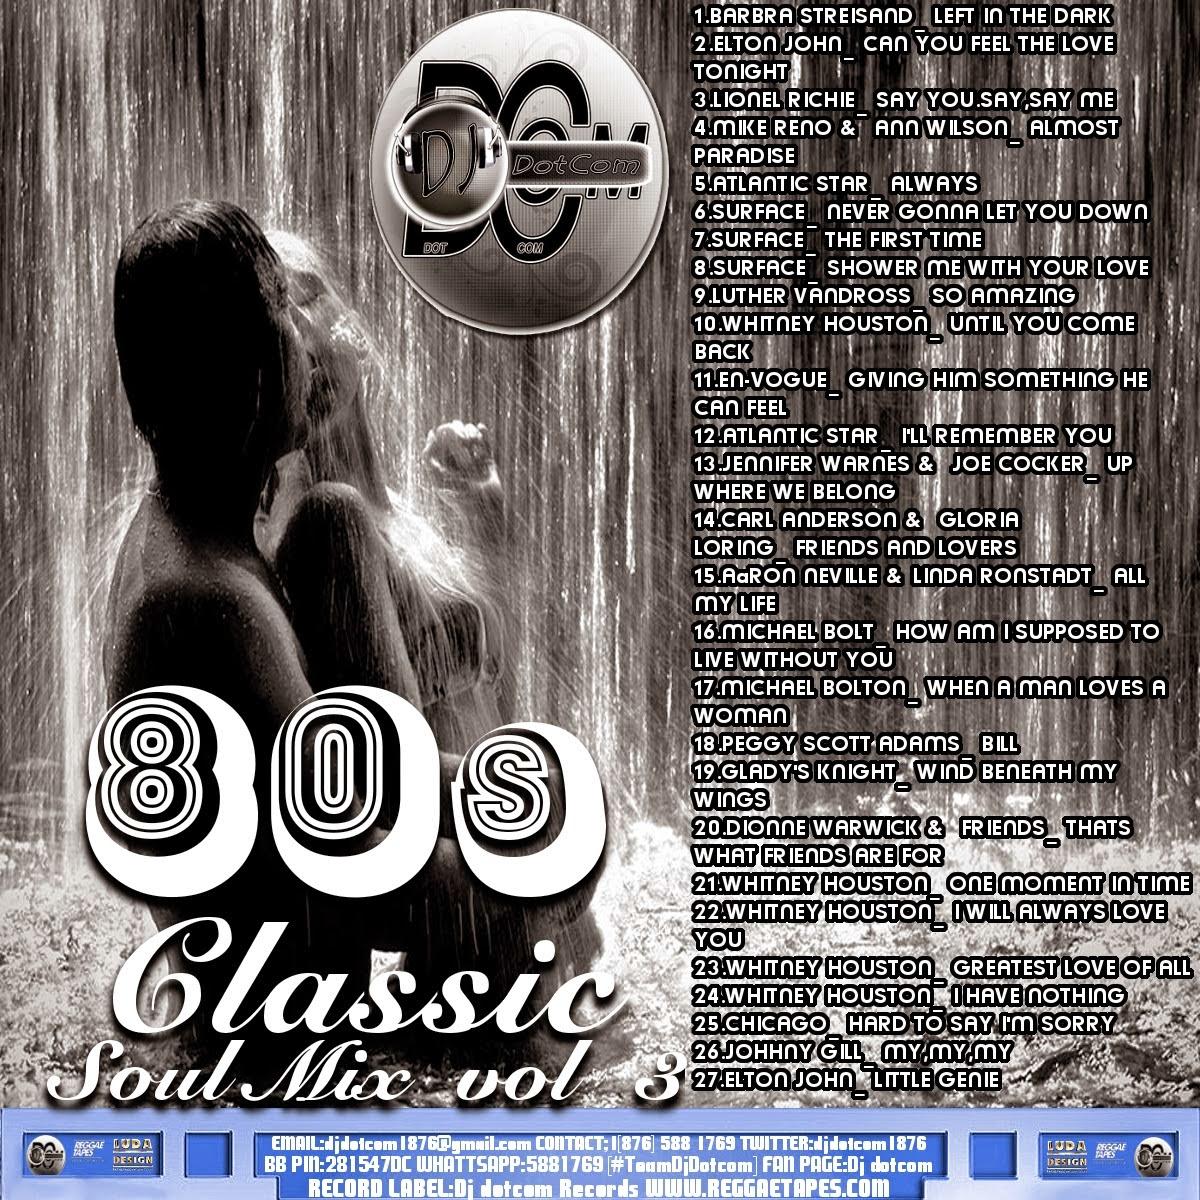 REGGAETAPES: DJ DOTCOM - 80S CLASSIC SOUL MIX VOL 3